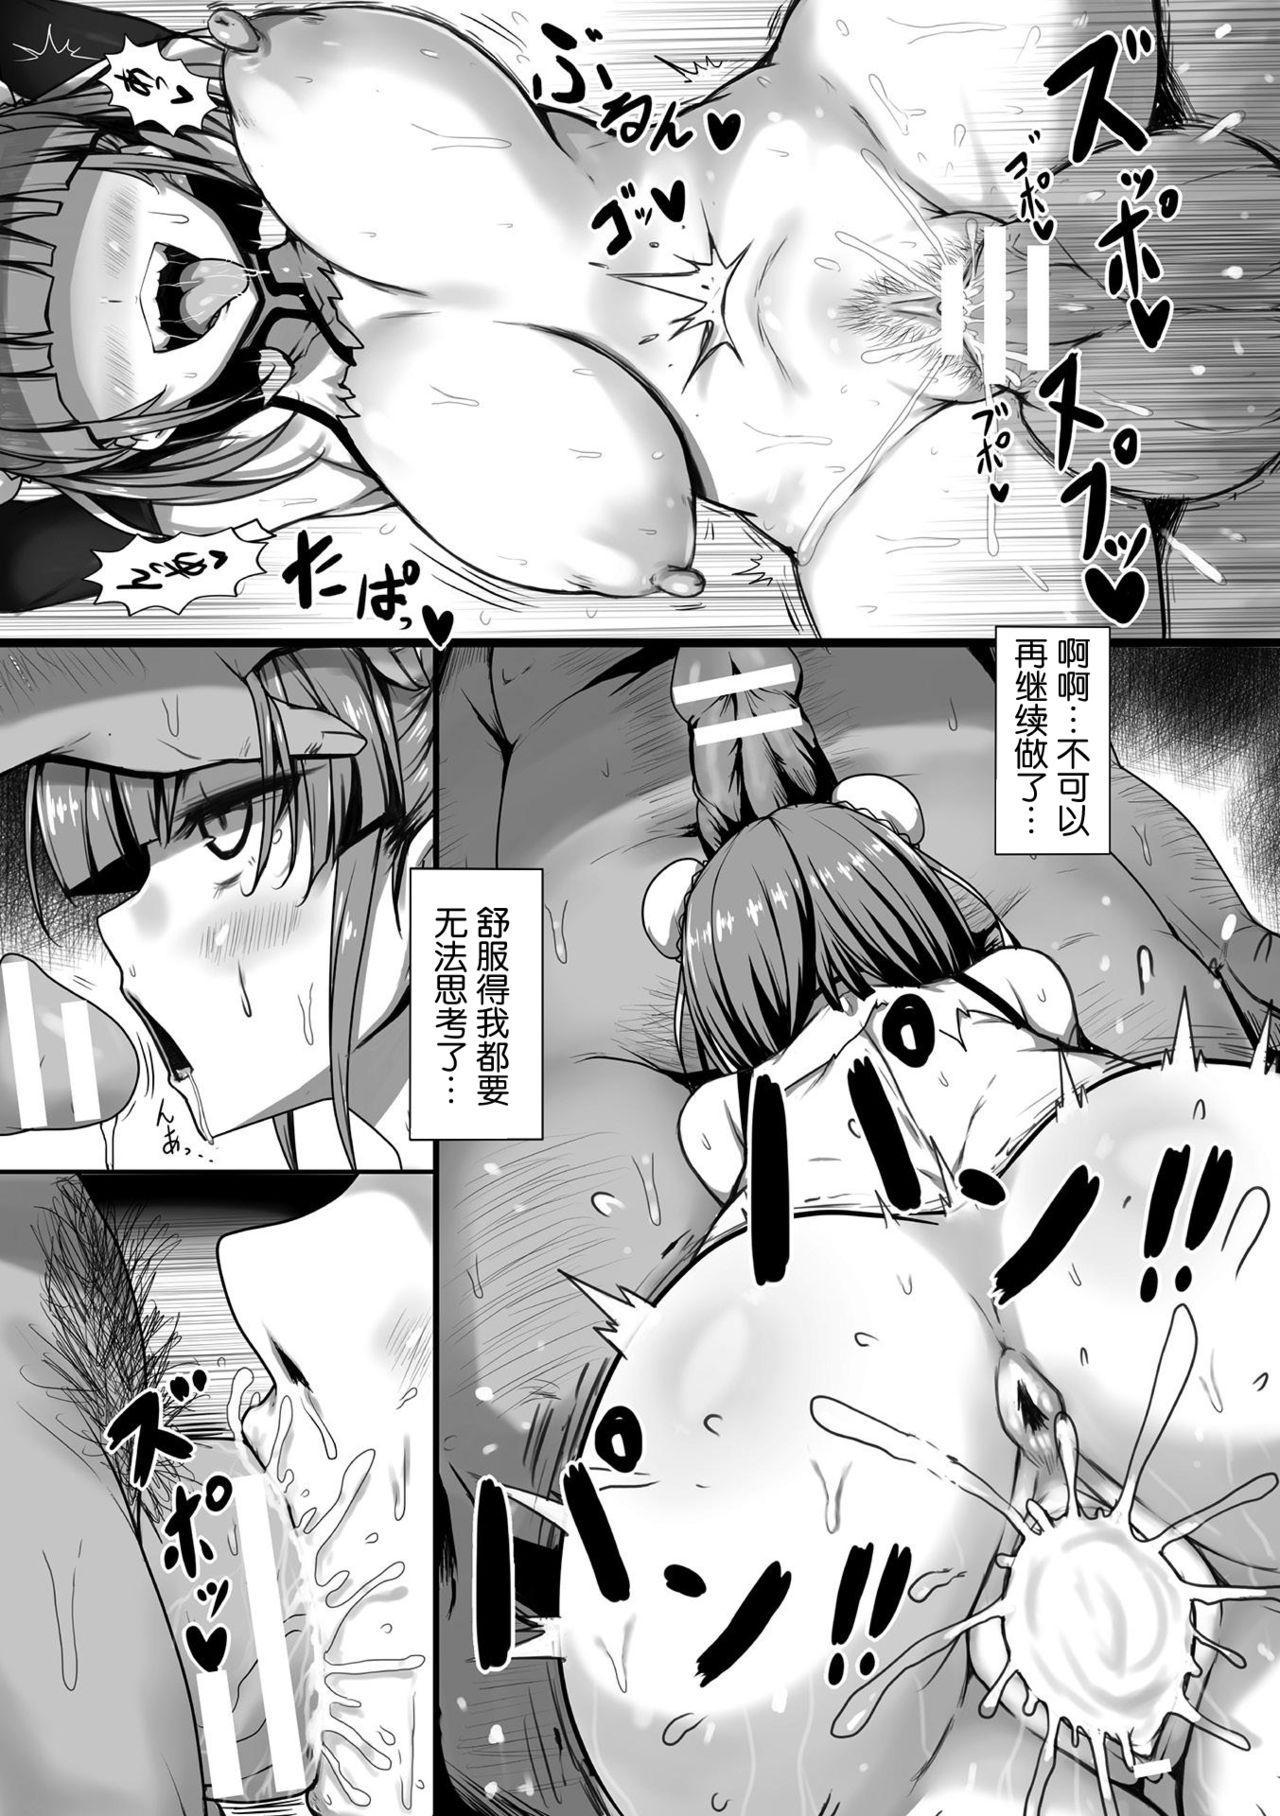 2D Comic Magazine Zecchou Kairaku ga Tomaranai Ero-Trap Dungeon Vol. 1 20